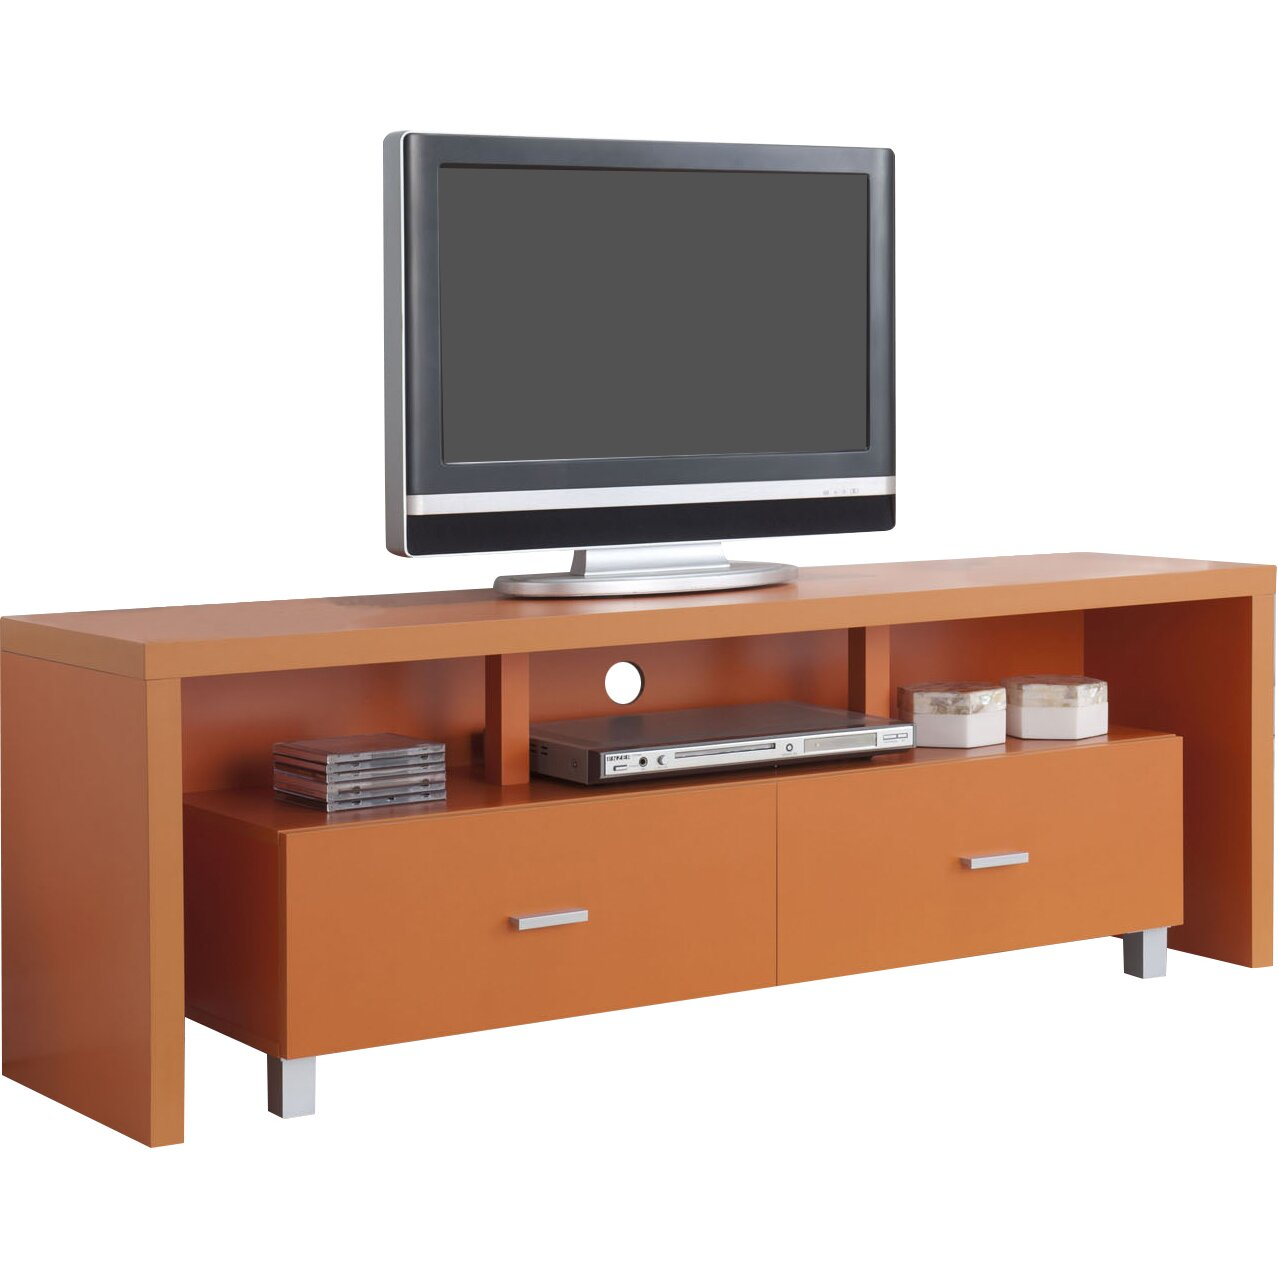 Hokku Designs Tv Stand Reviews